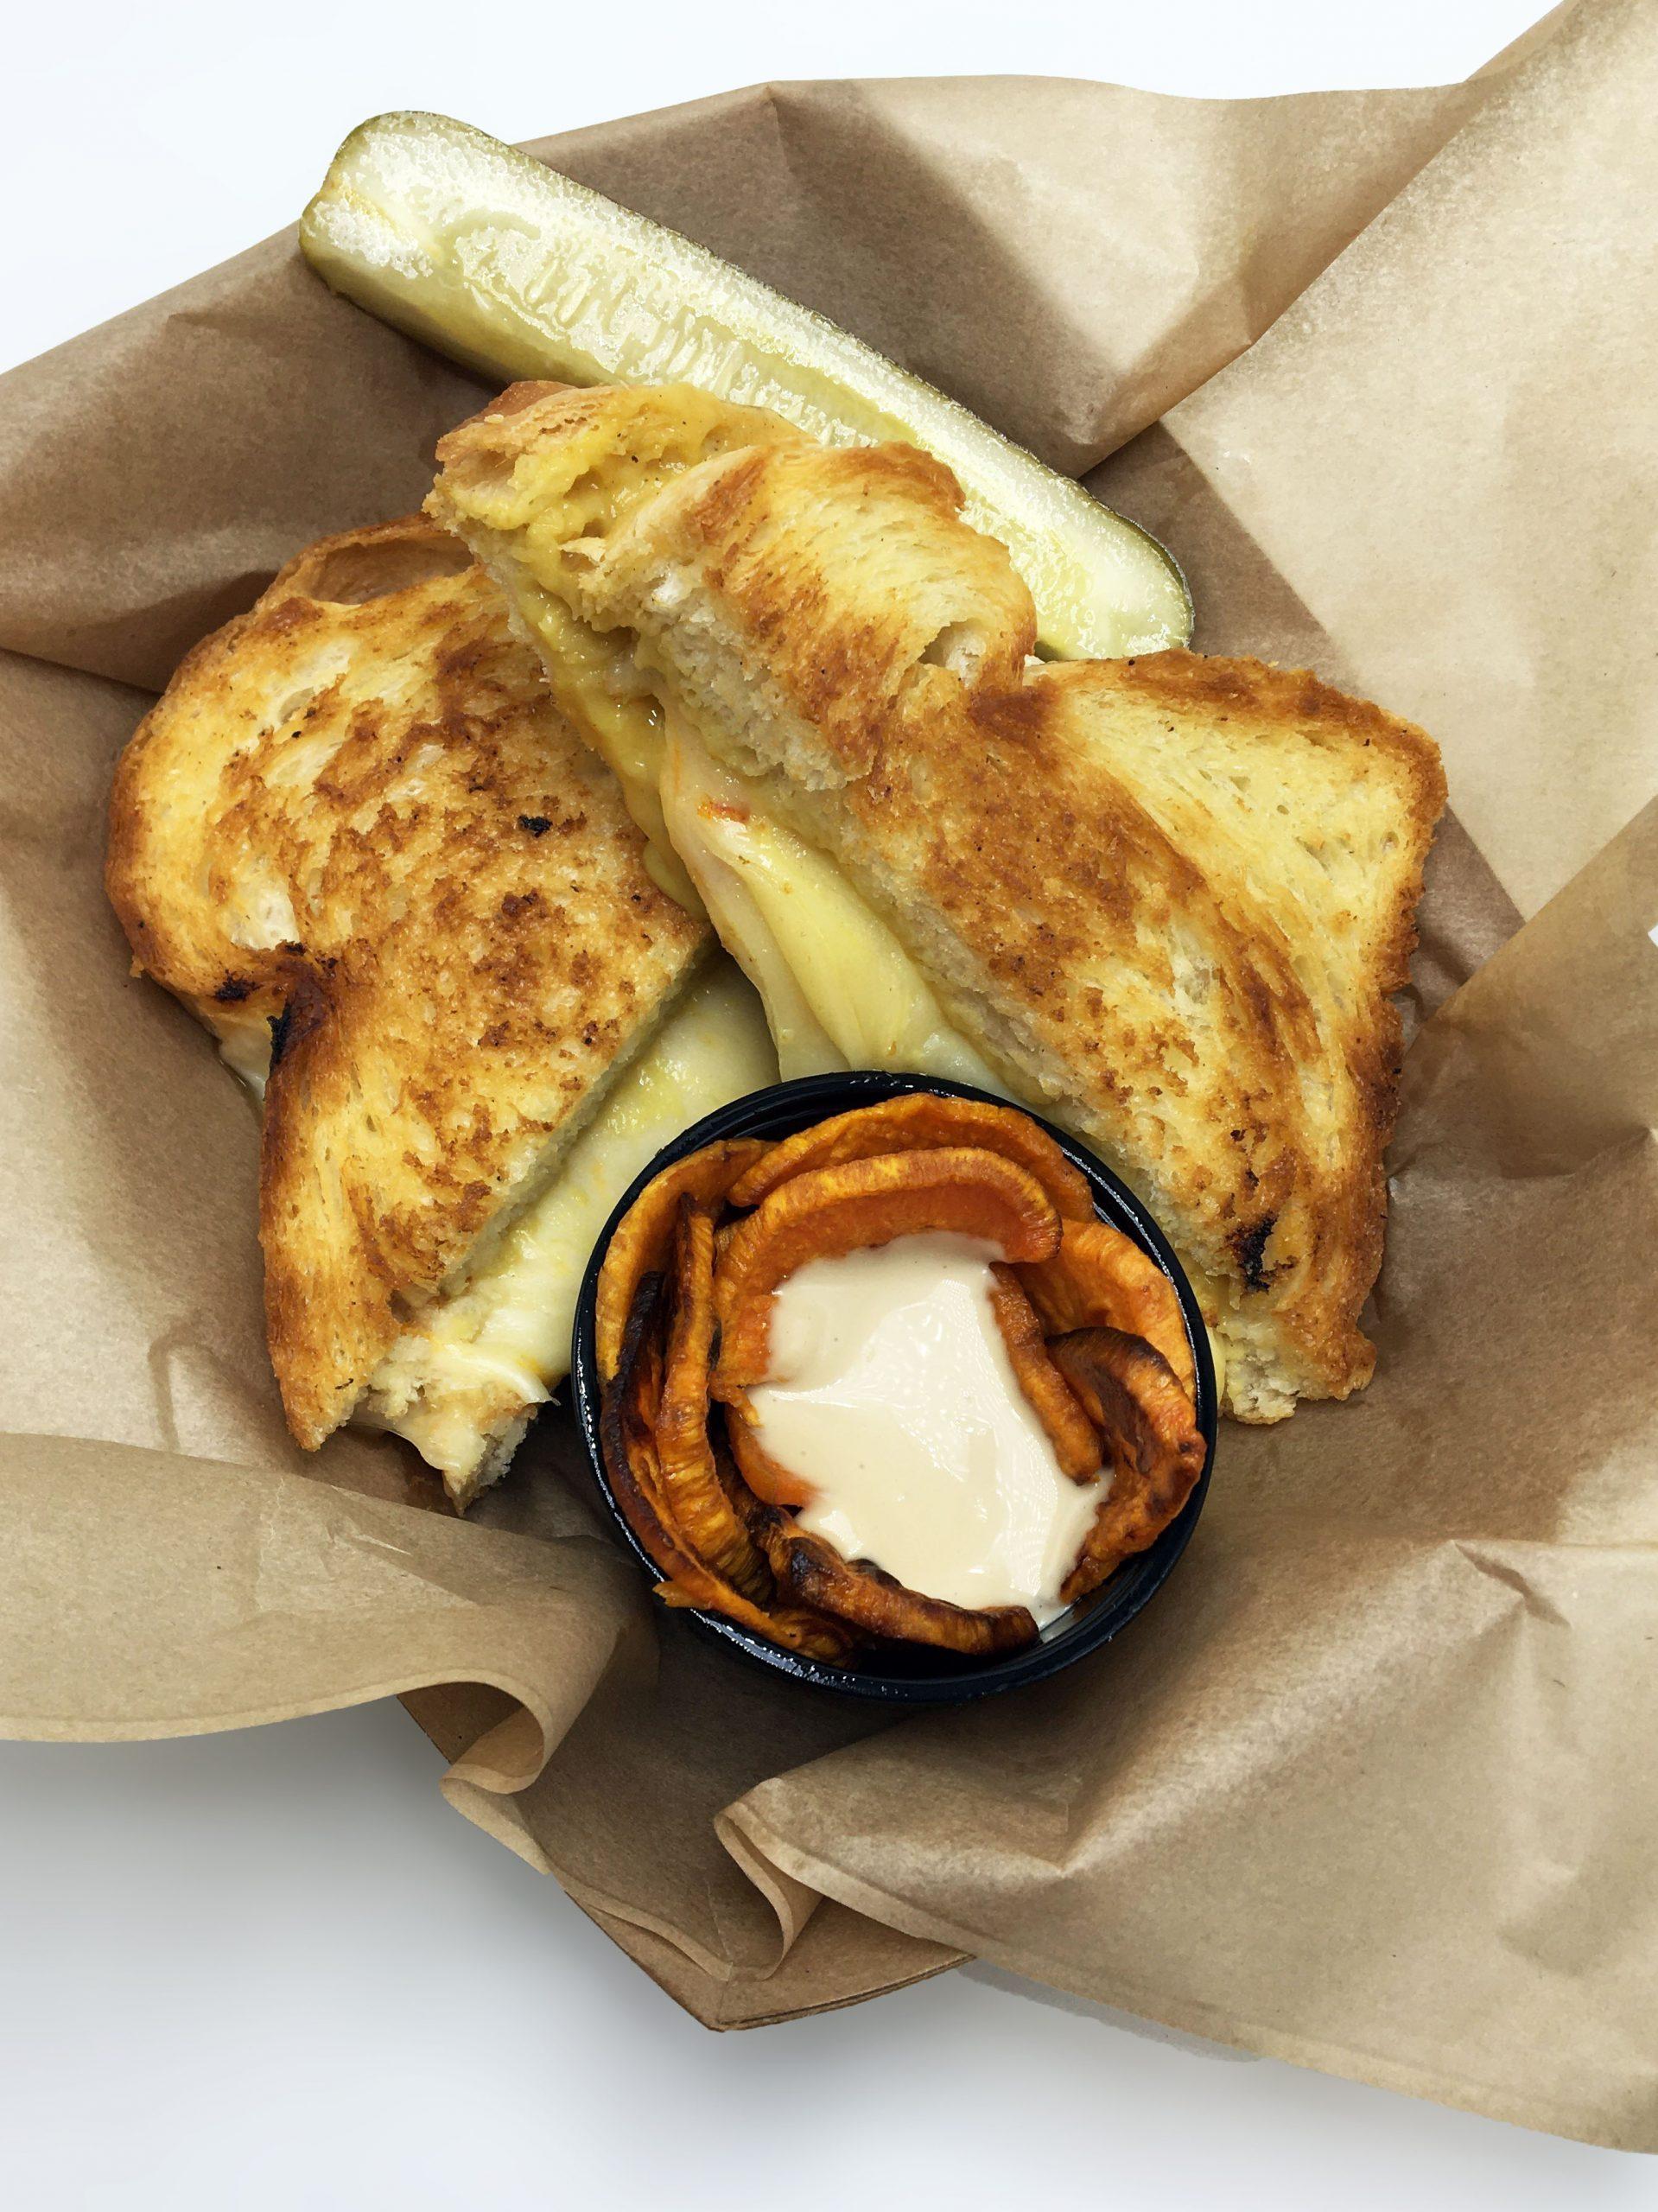 #31 - Heather's Fancy Schmancy Grilled Cheese